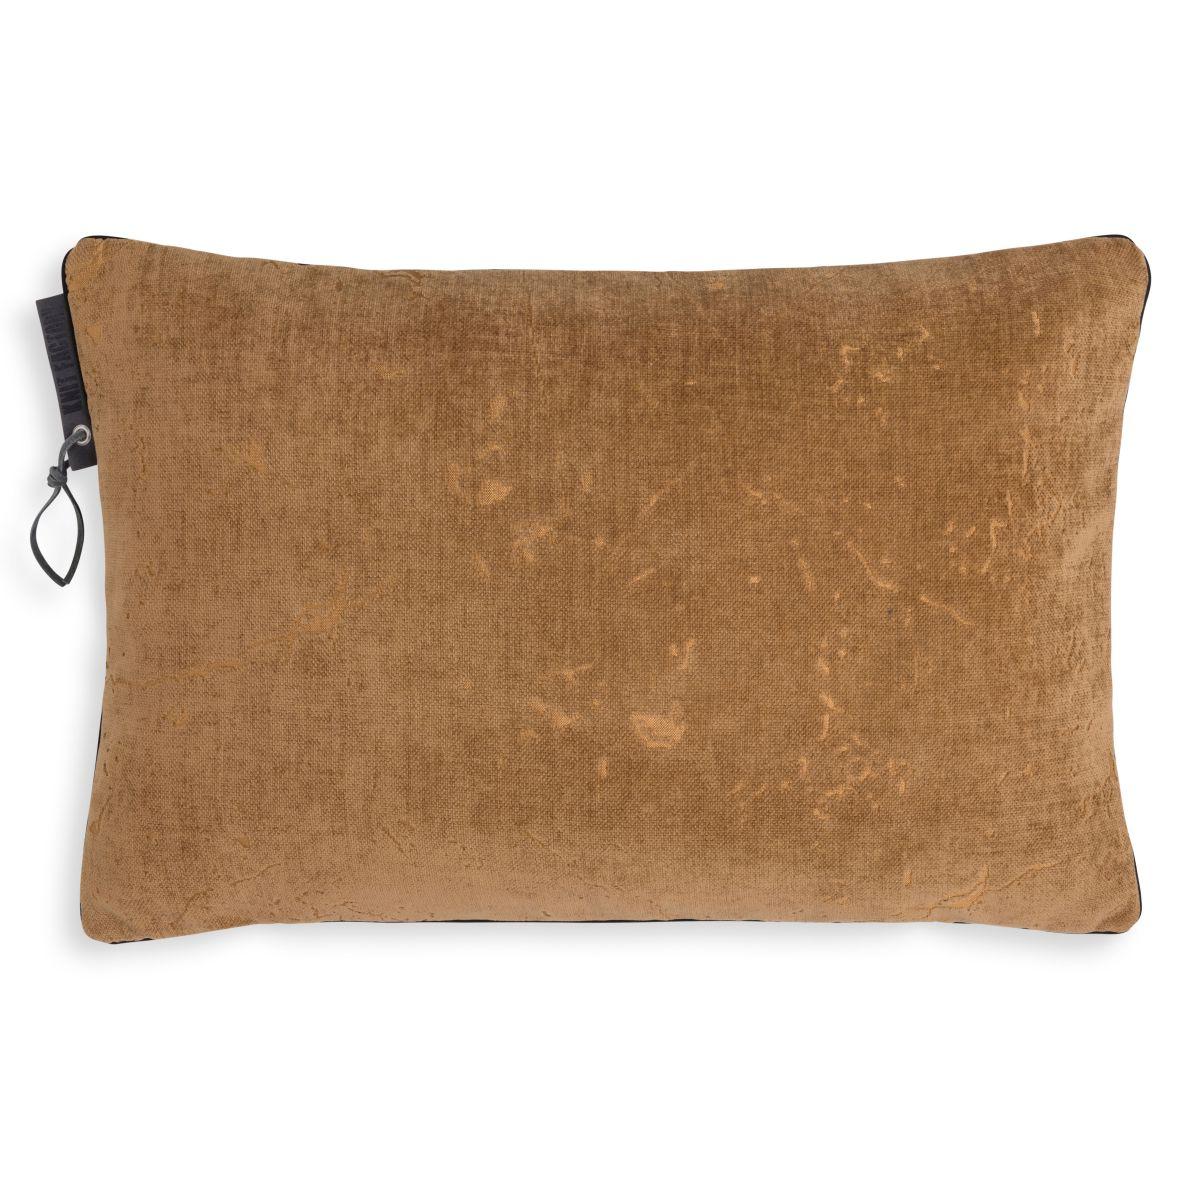 james cushion new camel 60x40